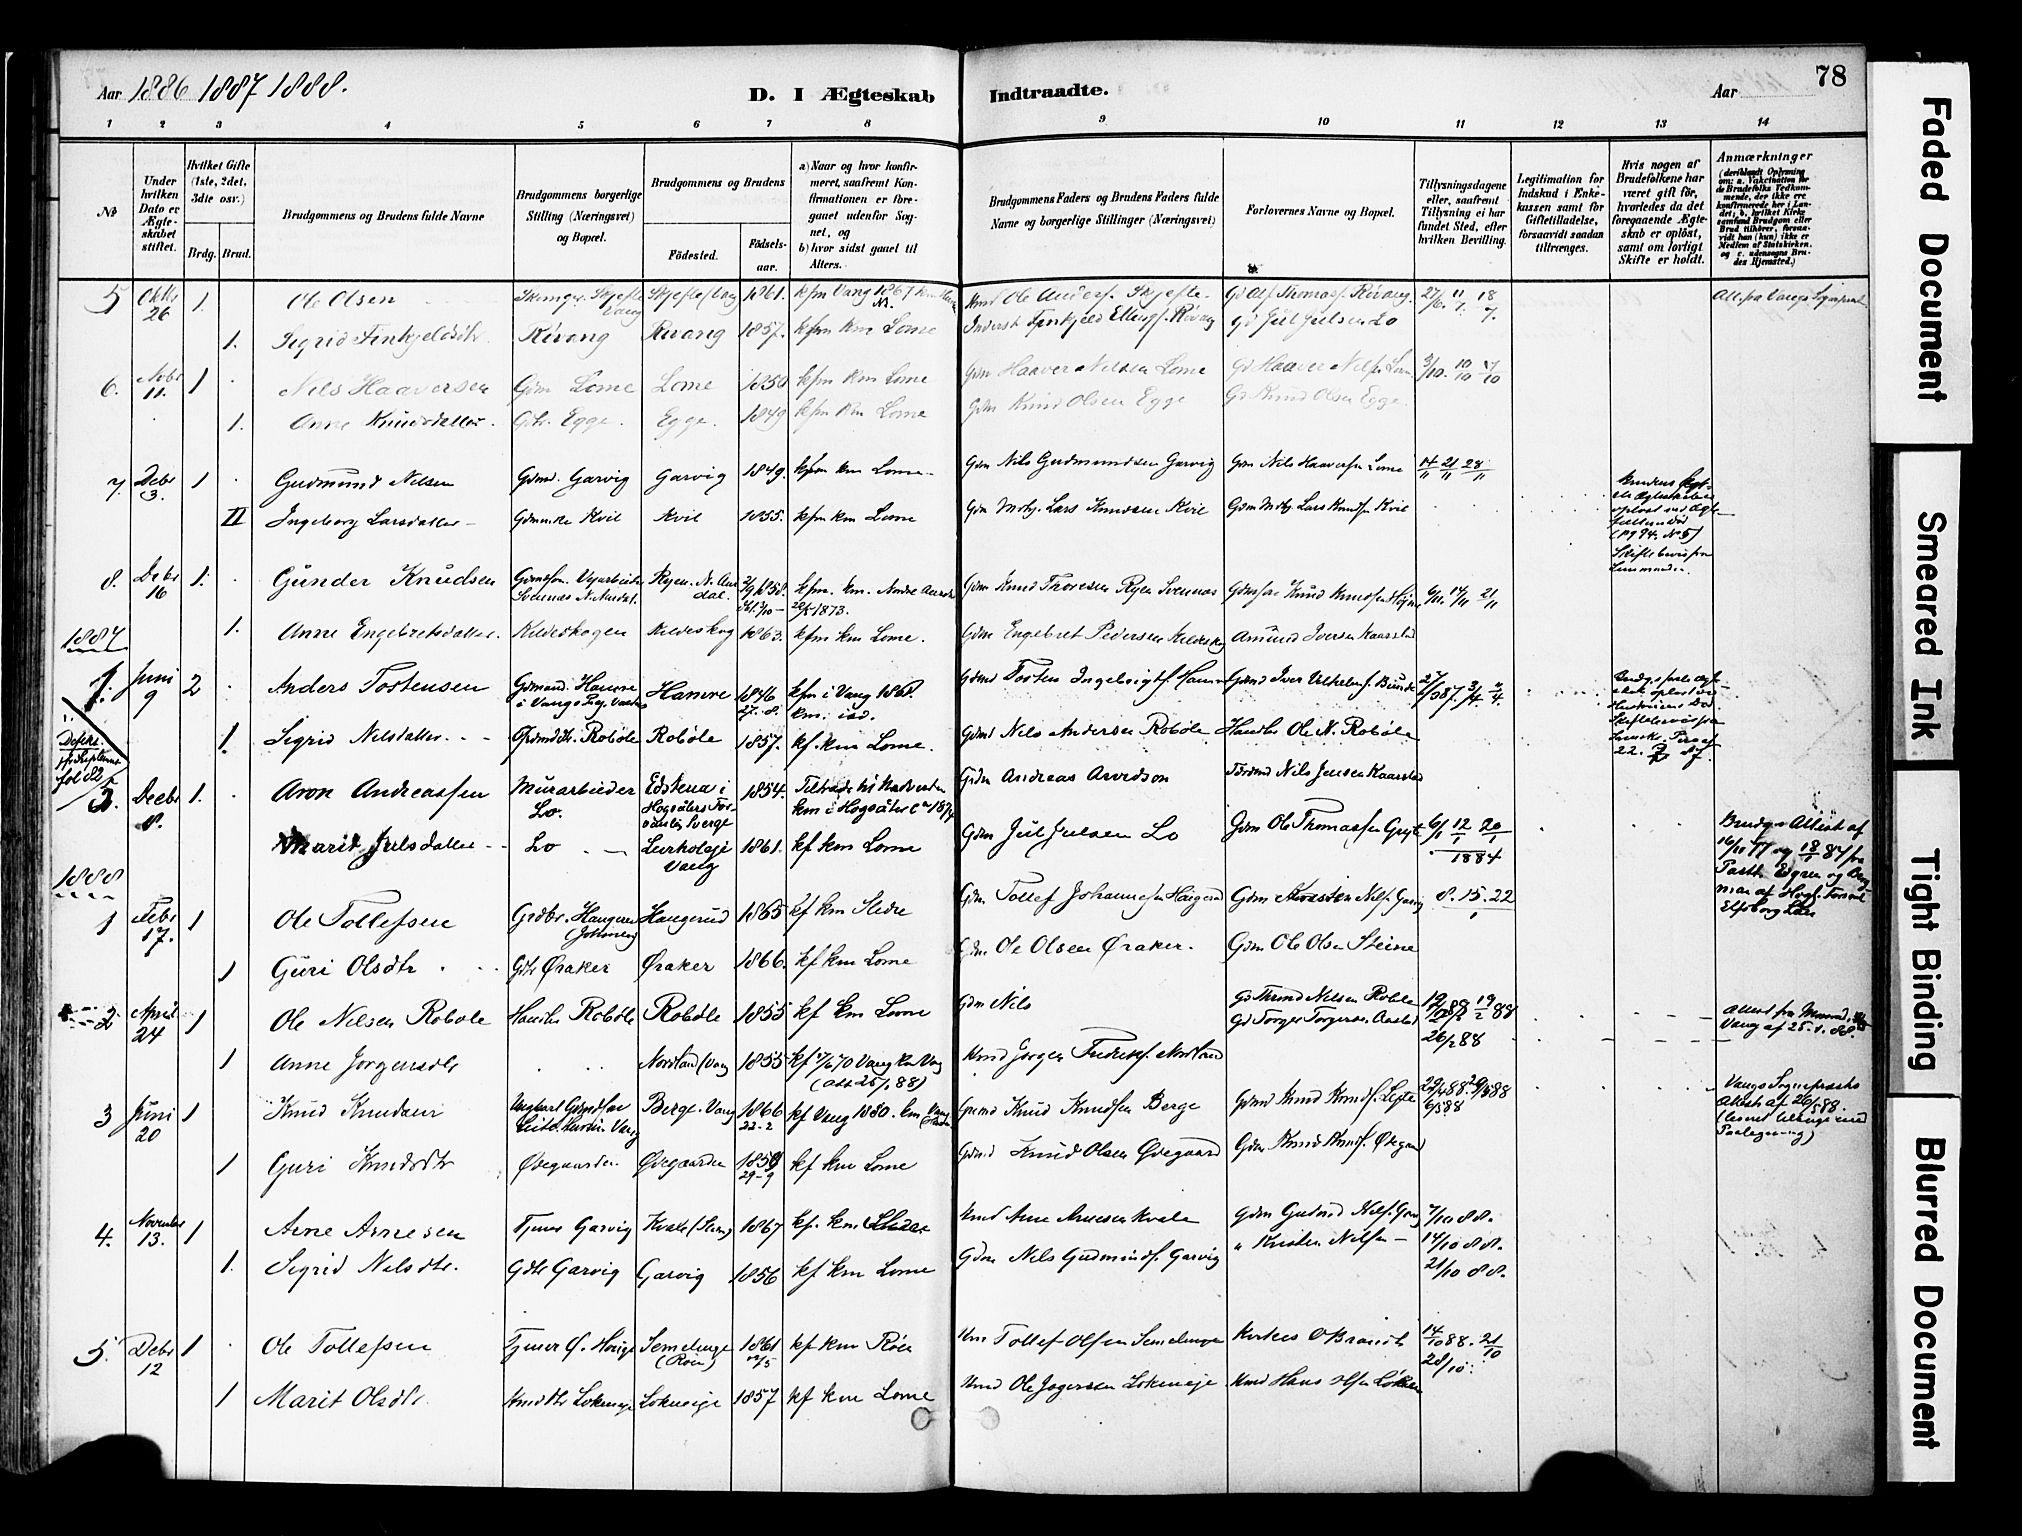 SAH, Vestre Slidre prestekontor, Ministerialbok nr. 5, 1881-1912, s. 78